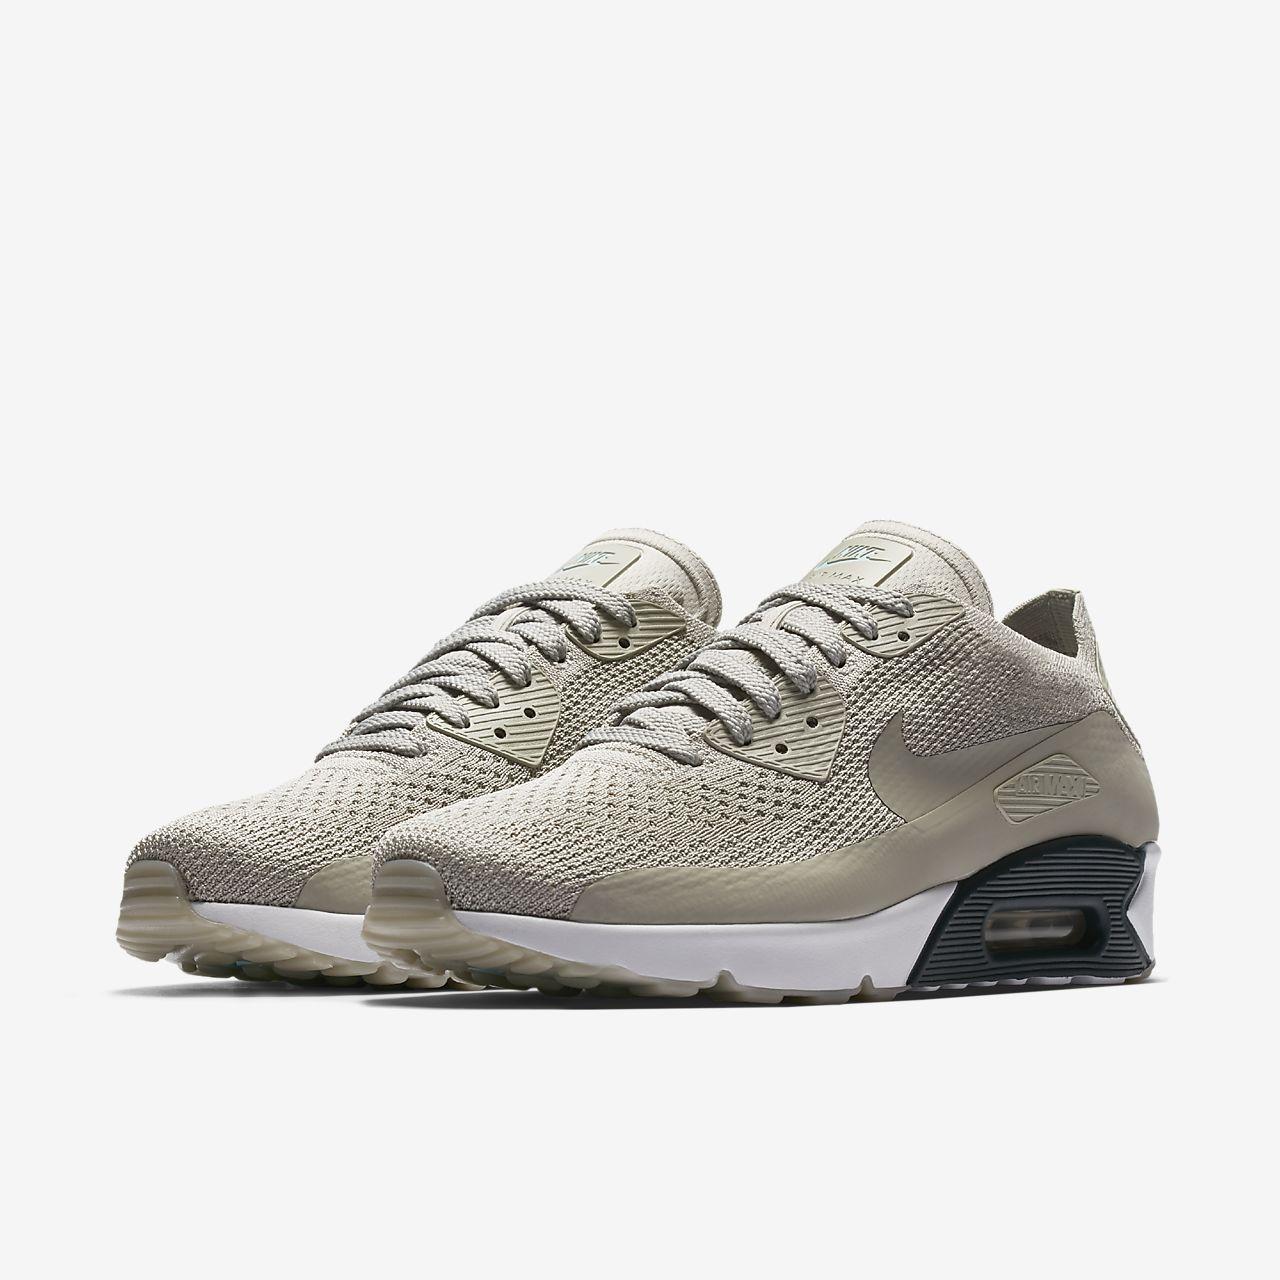 nike air max 90 femme chaussures gris noir 2018 nz